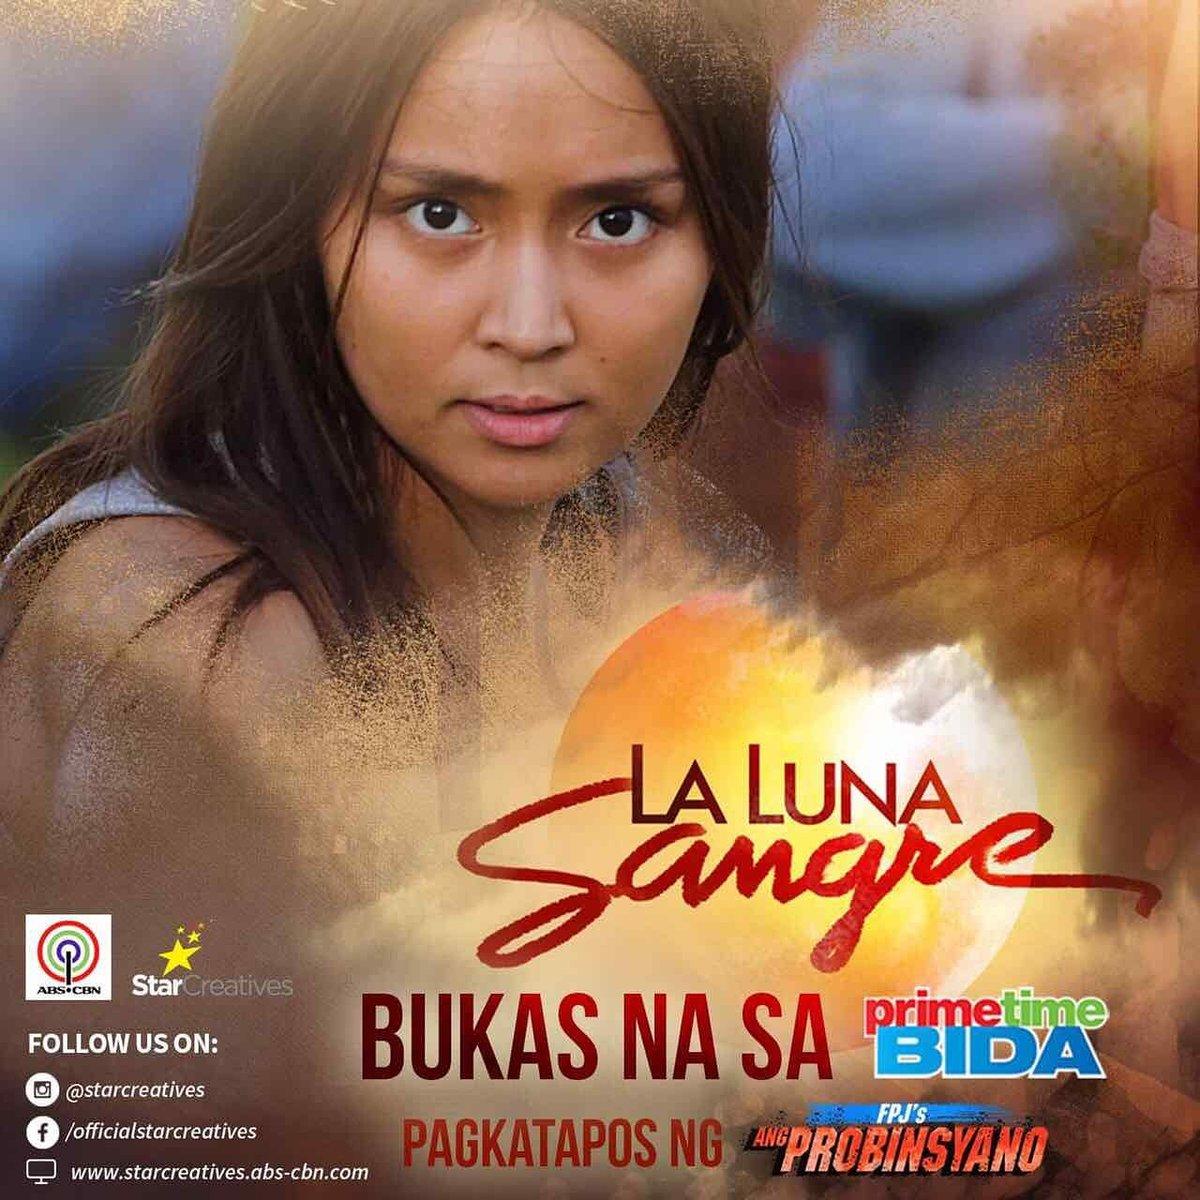 Kathryn Bernardo as Malia #LaLunaSangreA...